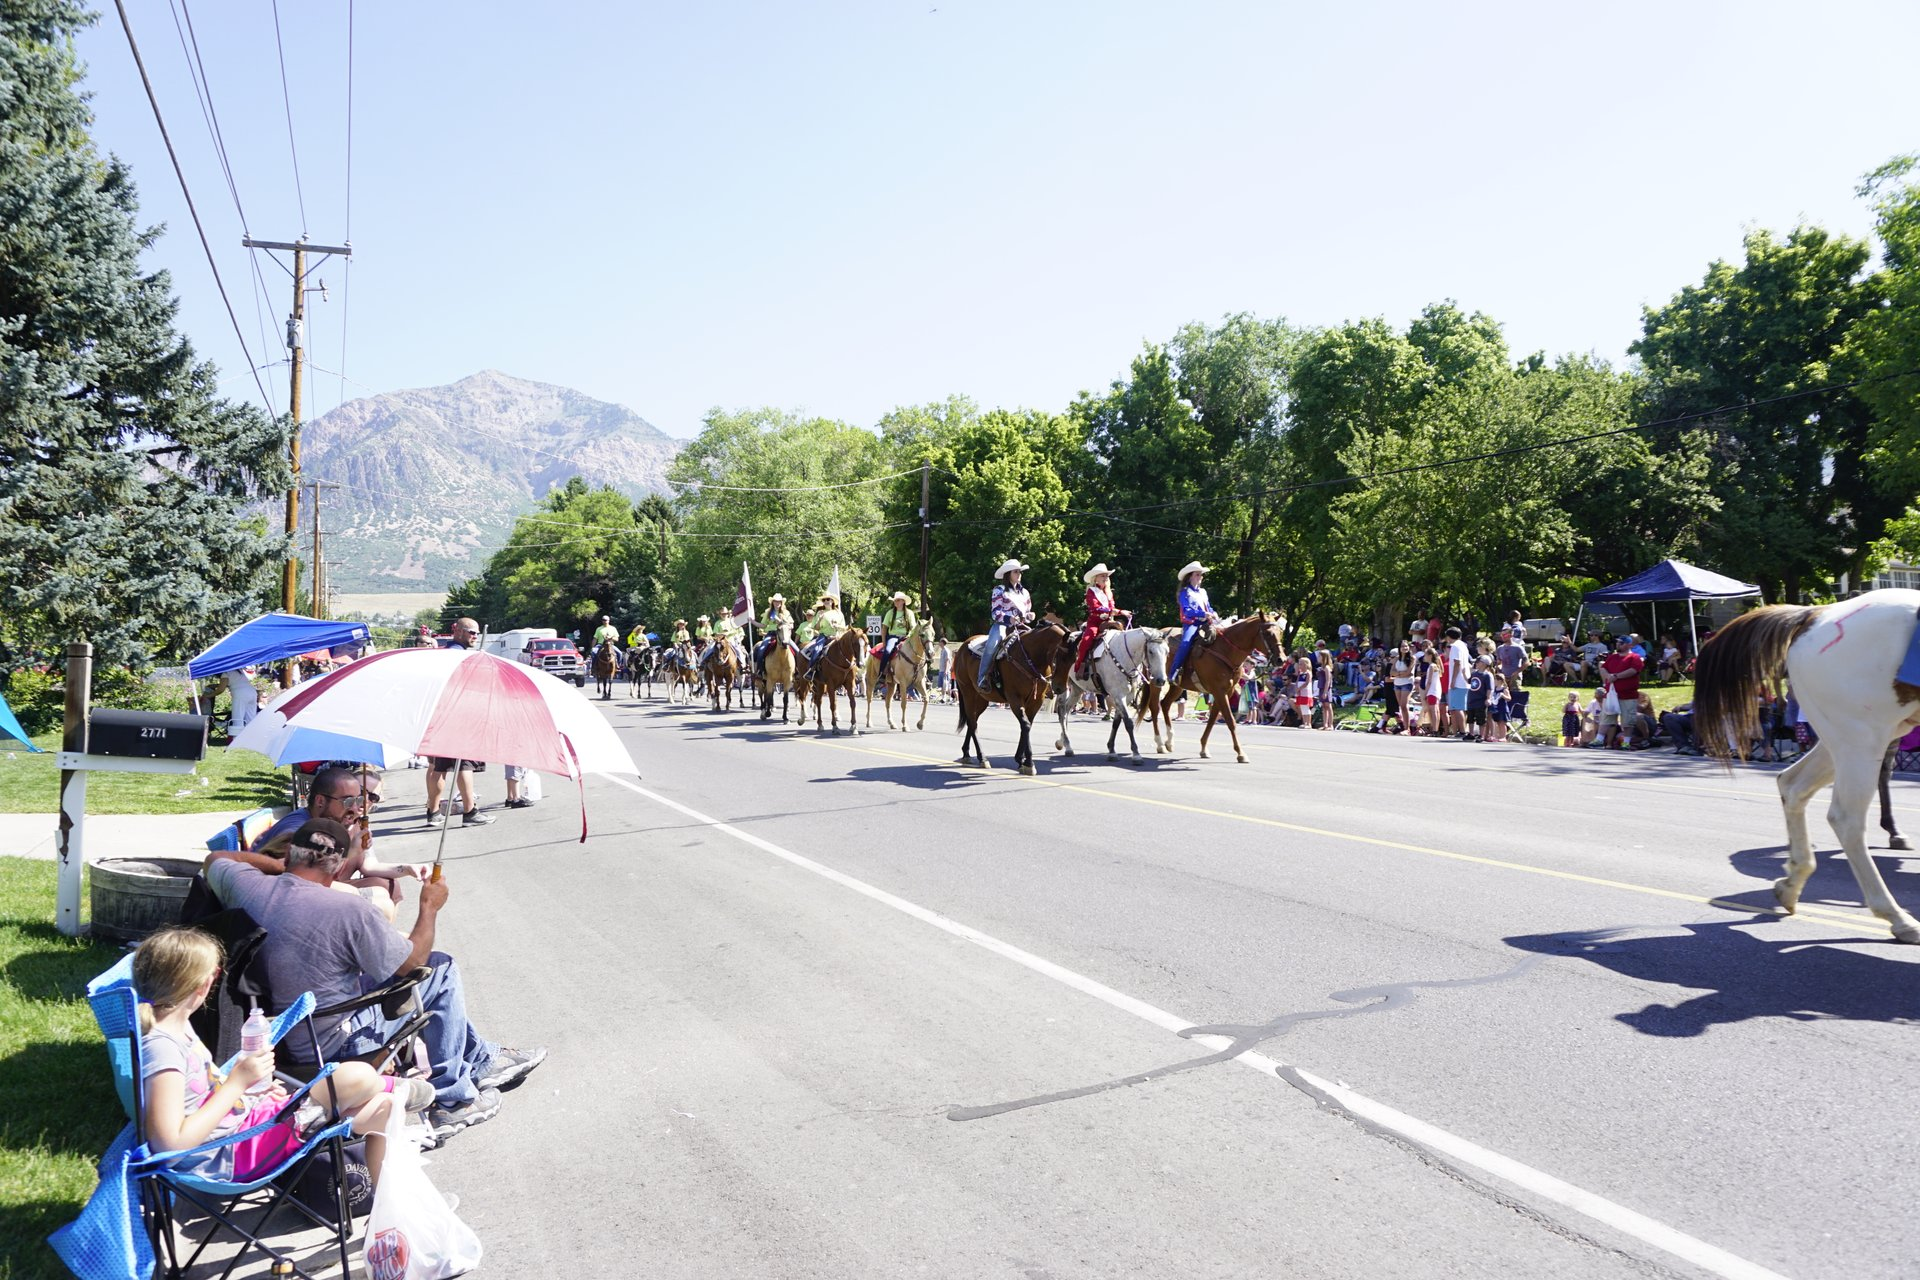 North Ogden 4th of July parade 2020